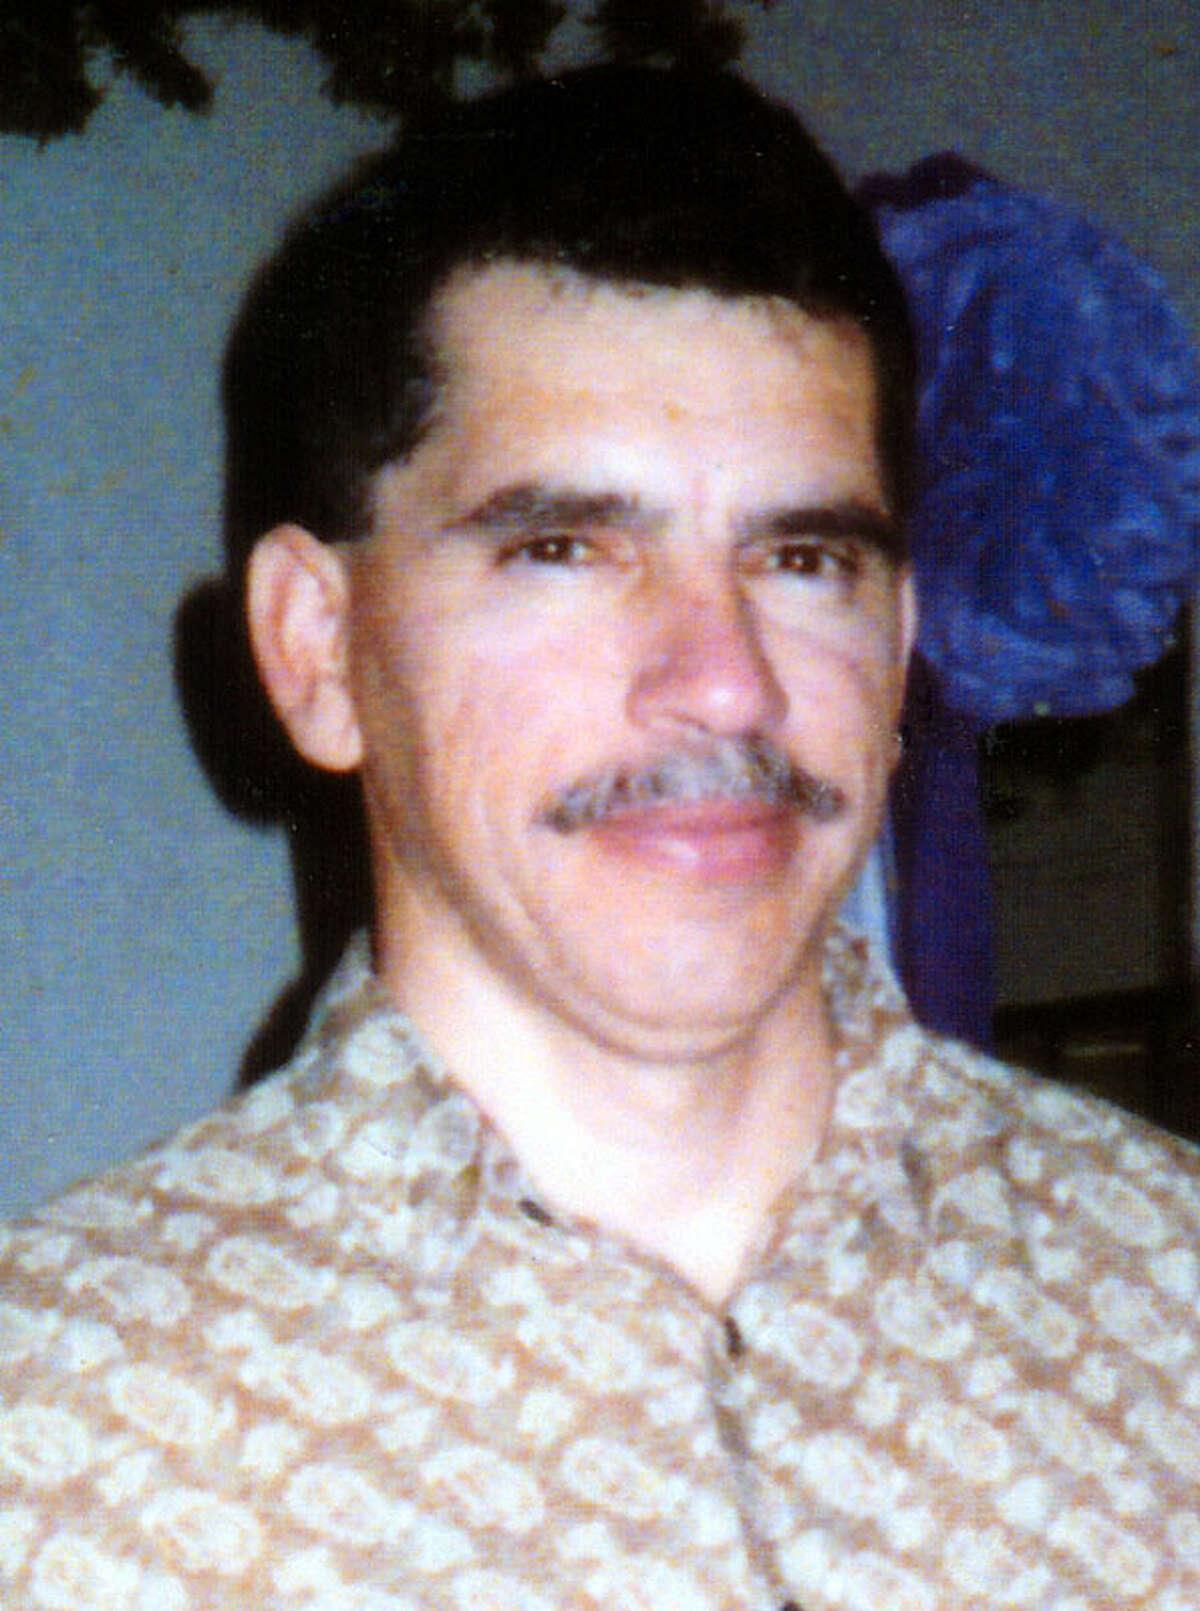 Paul Samudio, Jr. in undated family photo. Adrian Mendoza was arrested April 27, 2006 for killing him.